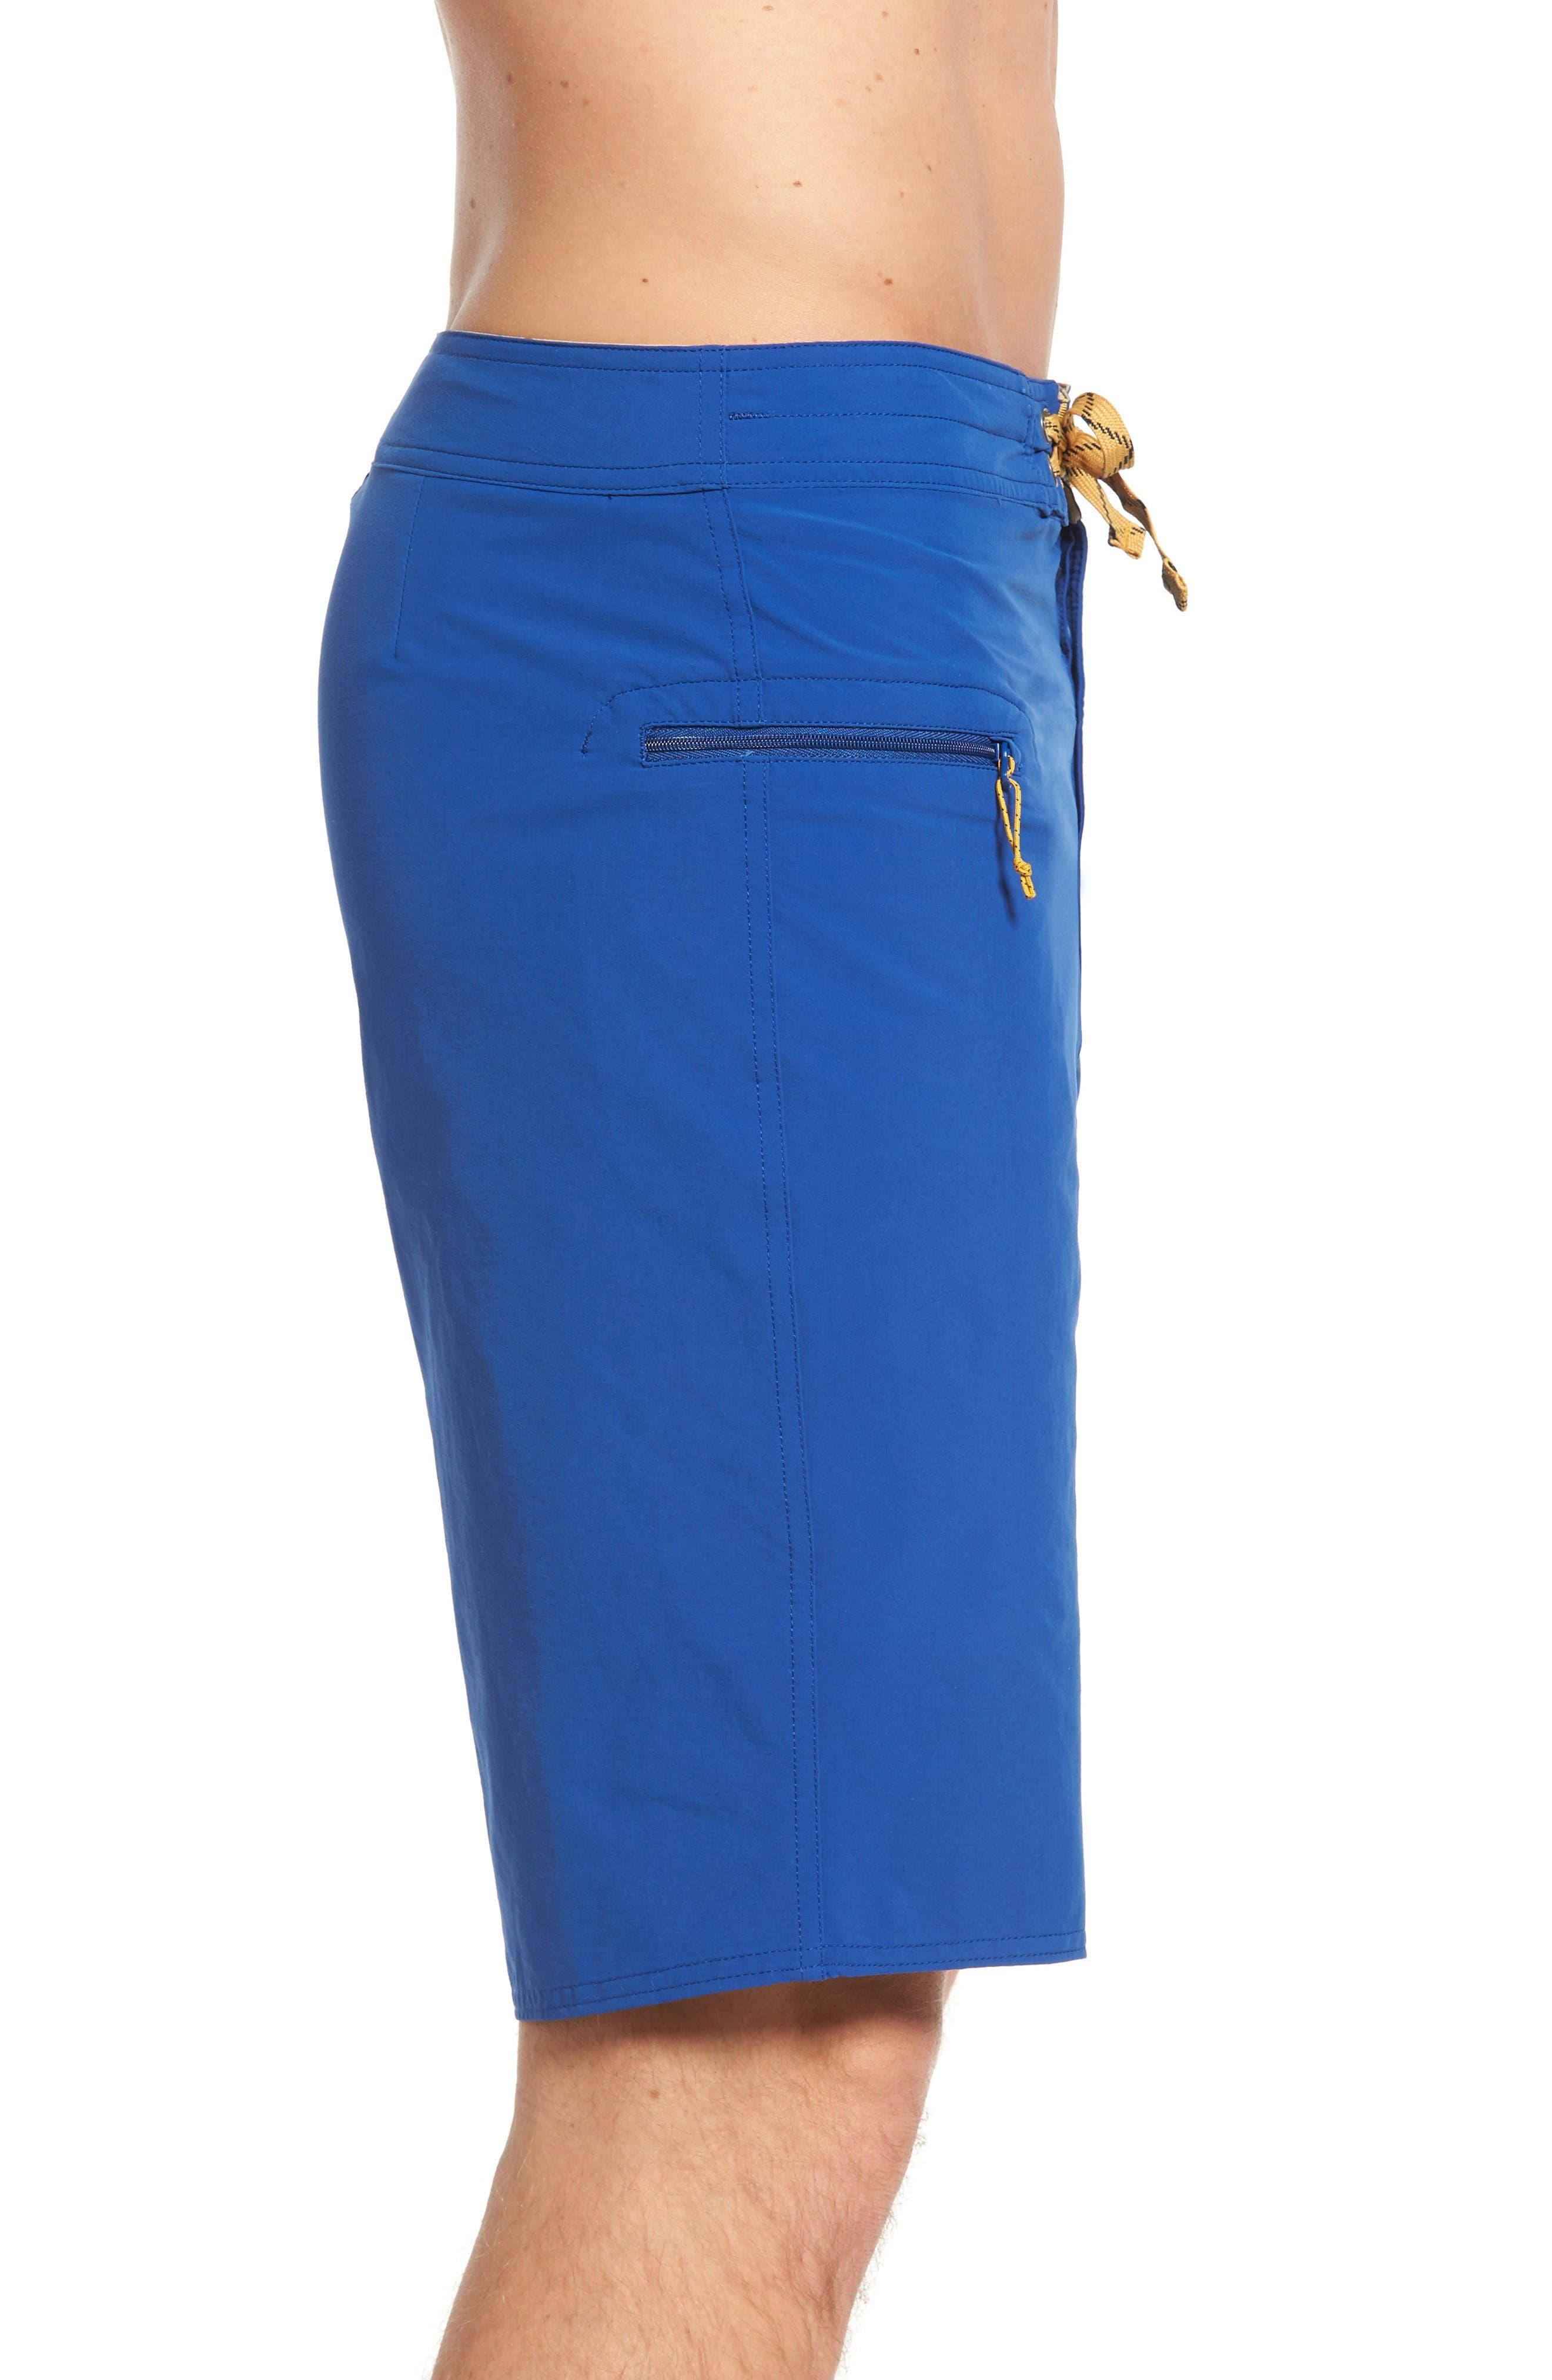 Wavefarer Board Shorts,                             Alternate thumbnail 3, color,                             Blue